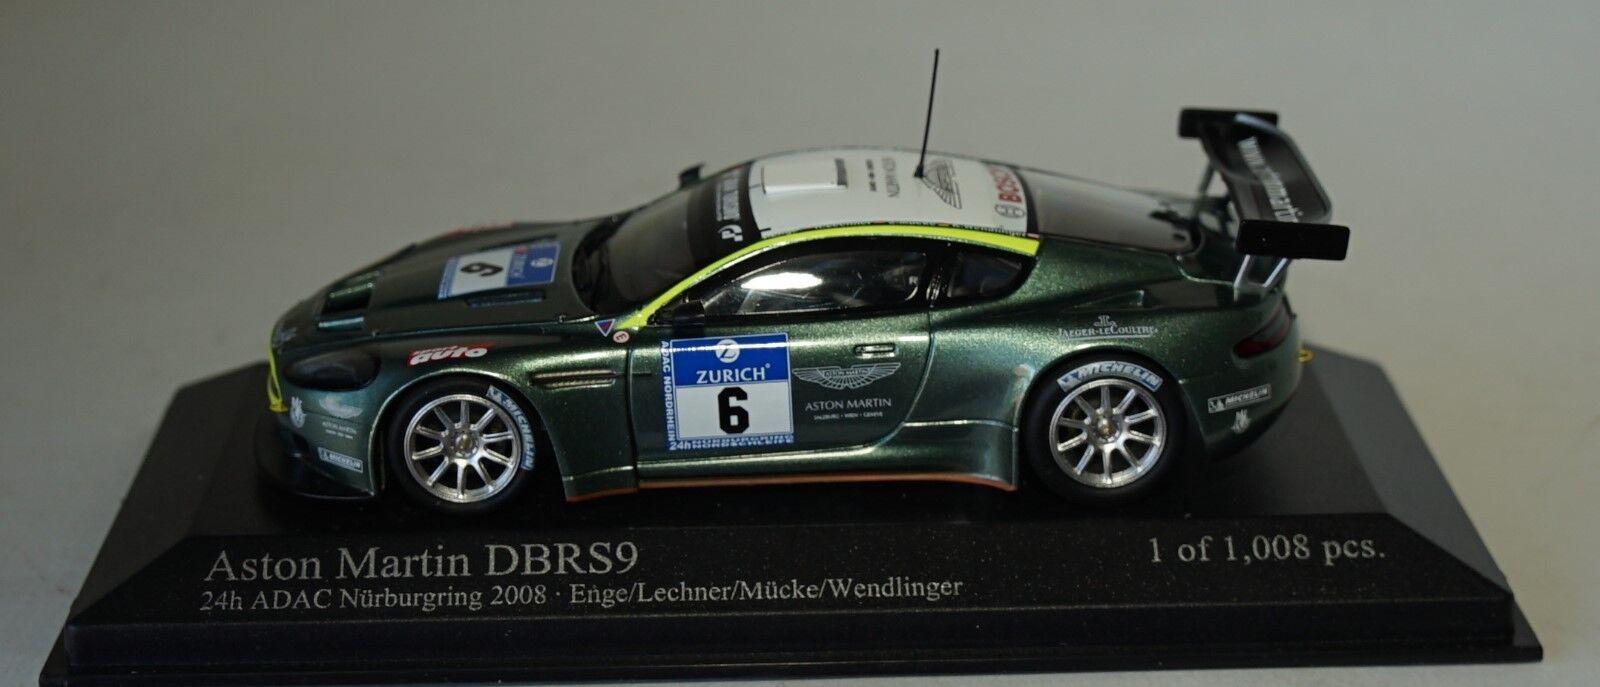 Minichamps 400081306 - 1 43 ASTON MARTIN DBRS 9 24HR Nurburgring 2008